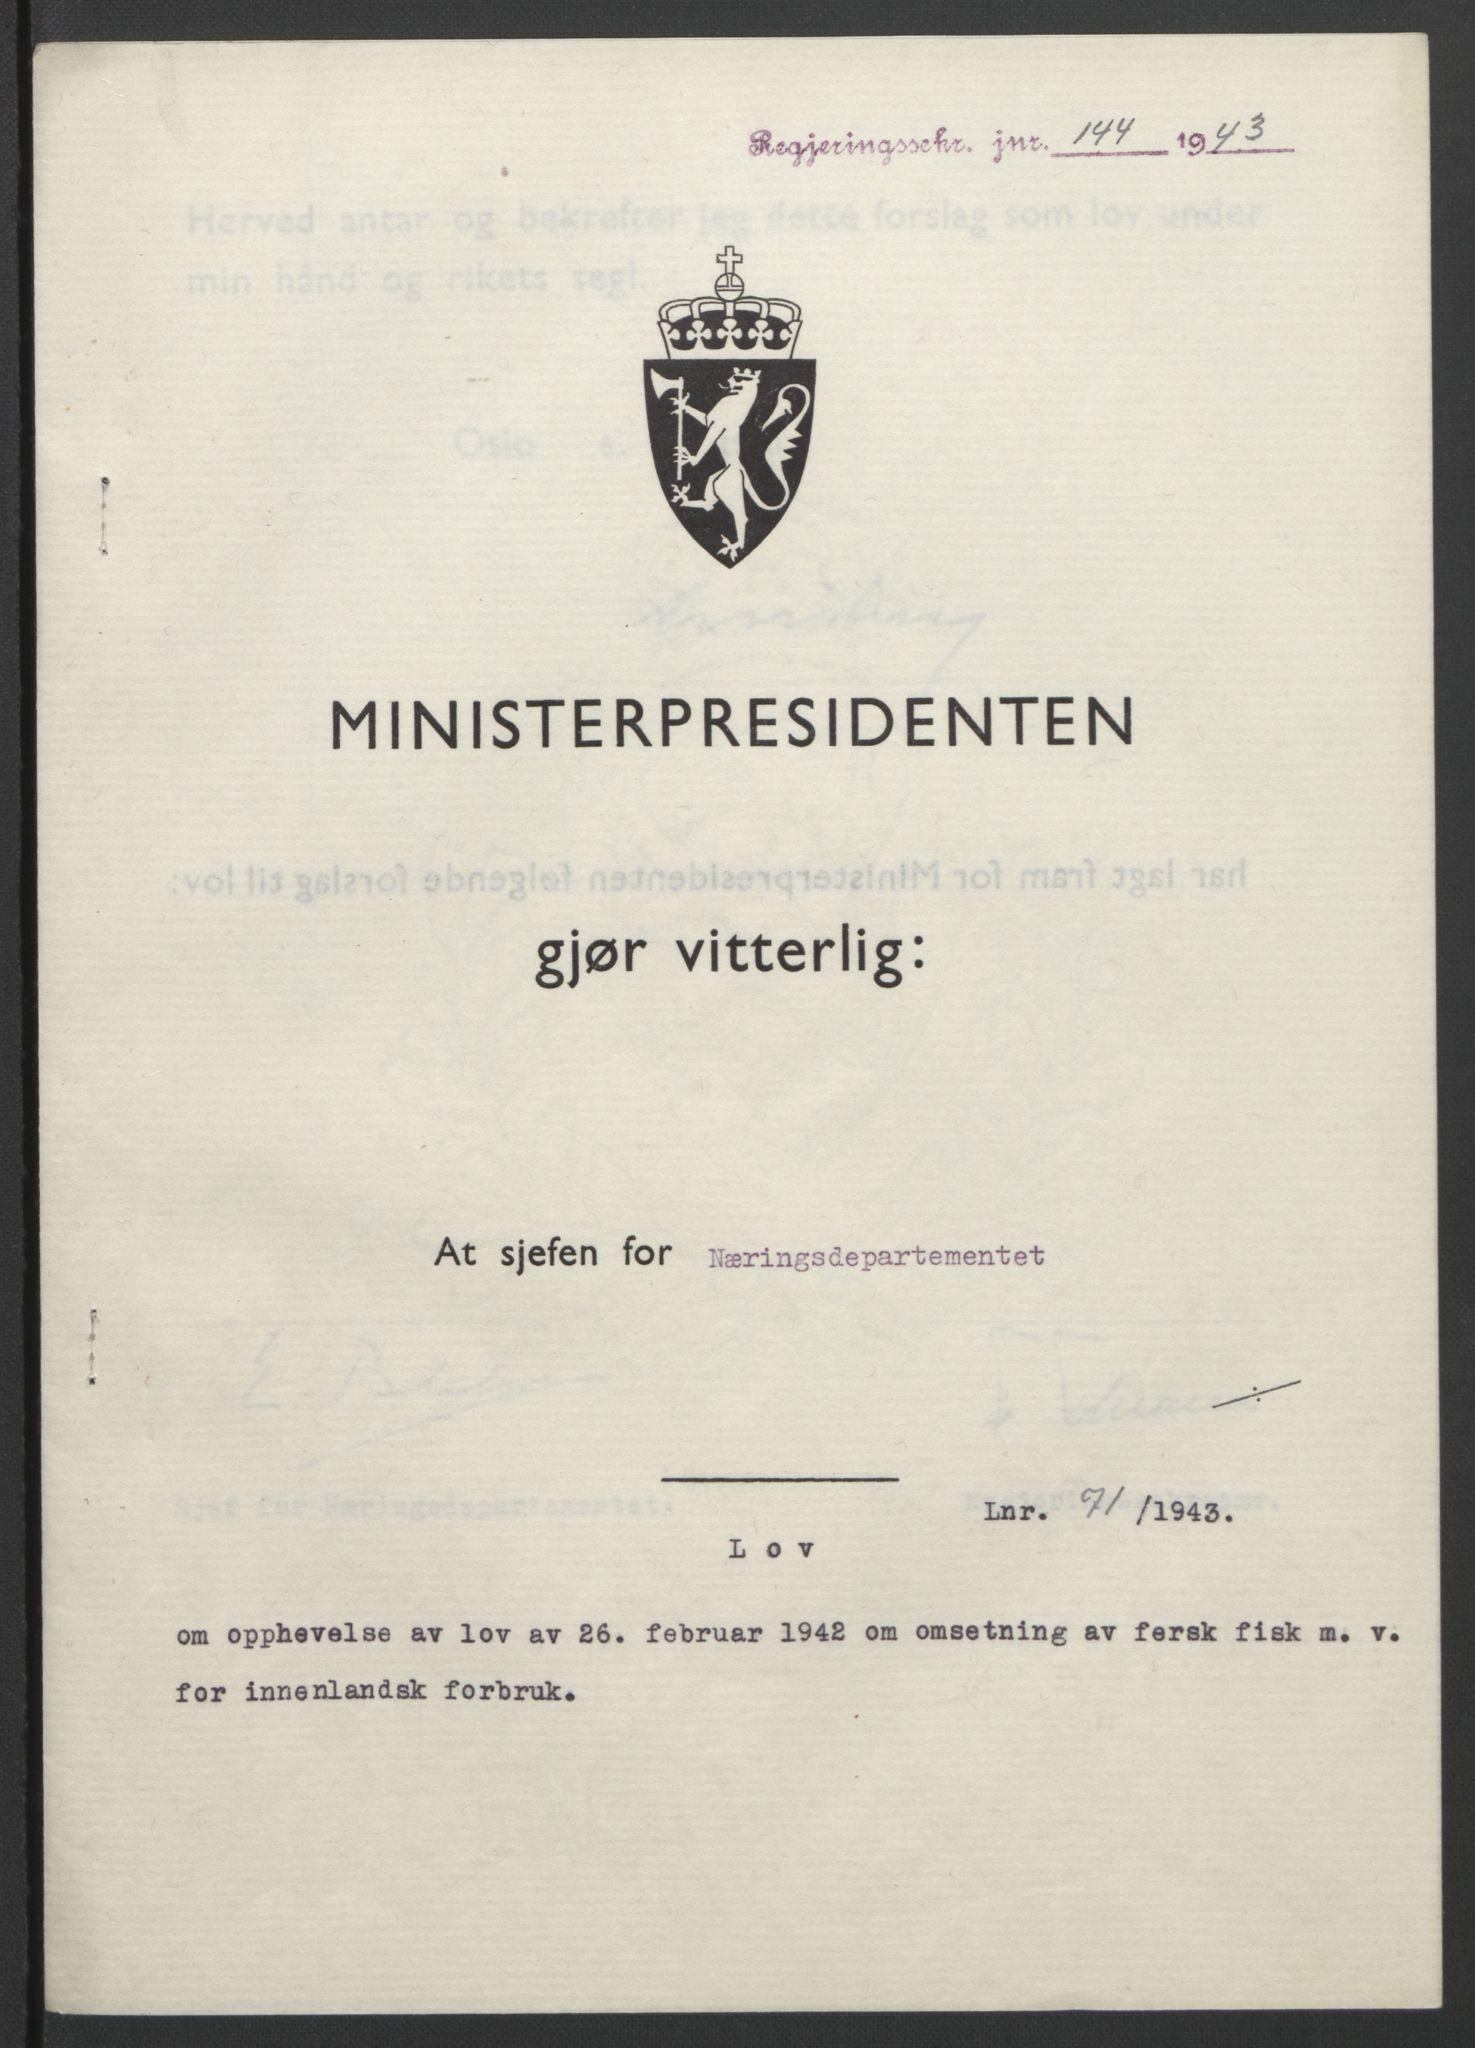 RA, NS-administrasjonen 1940-1945 (Statsrådsekretariatet, de kommisariske statsråder mm), D/Db/L0099: Lover, 1943, s. 324